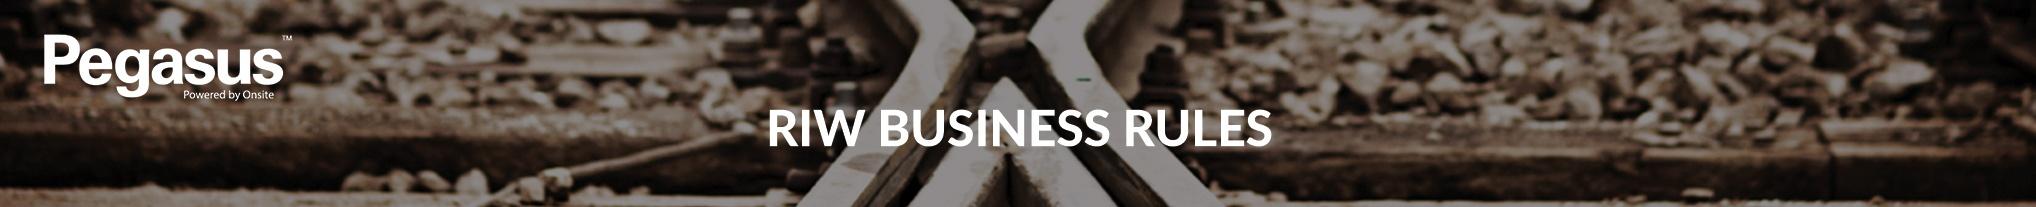 RIW Business Rules Header.jpg